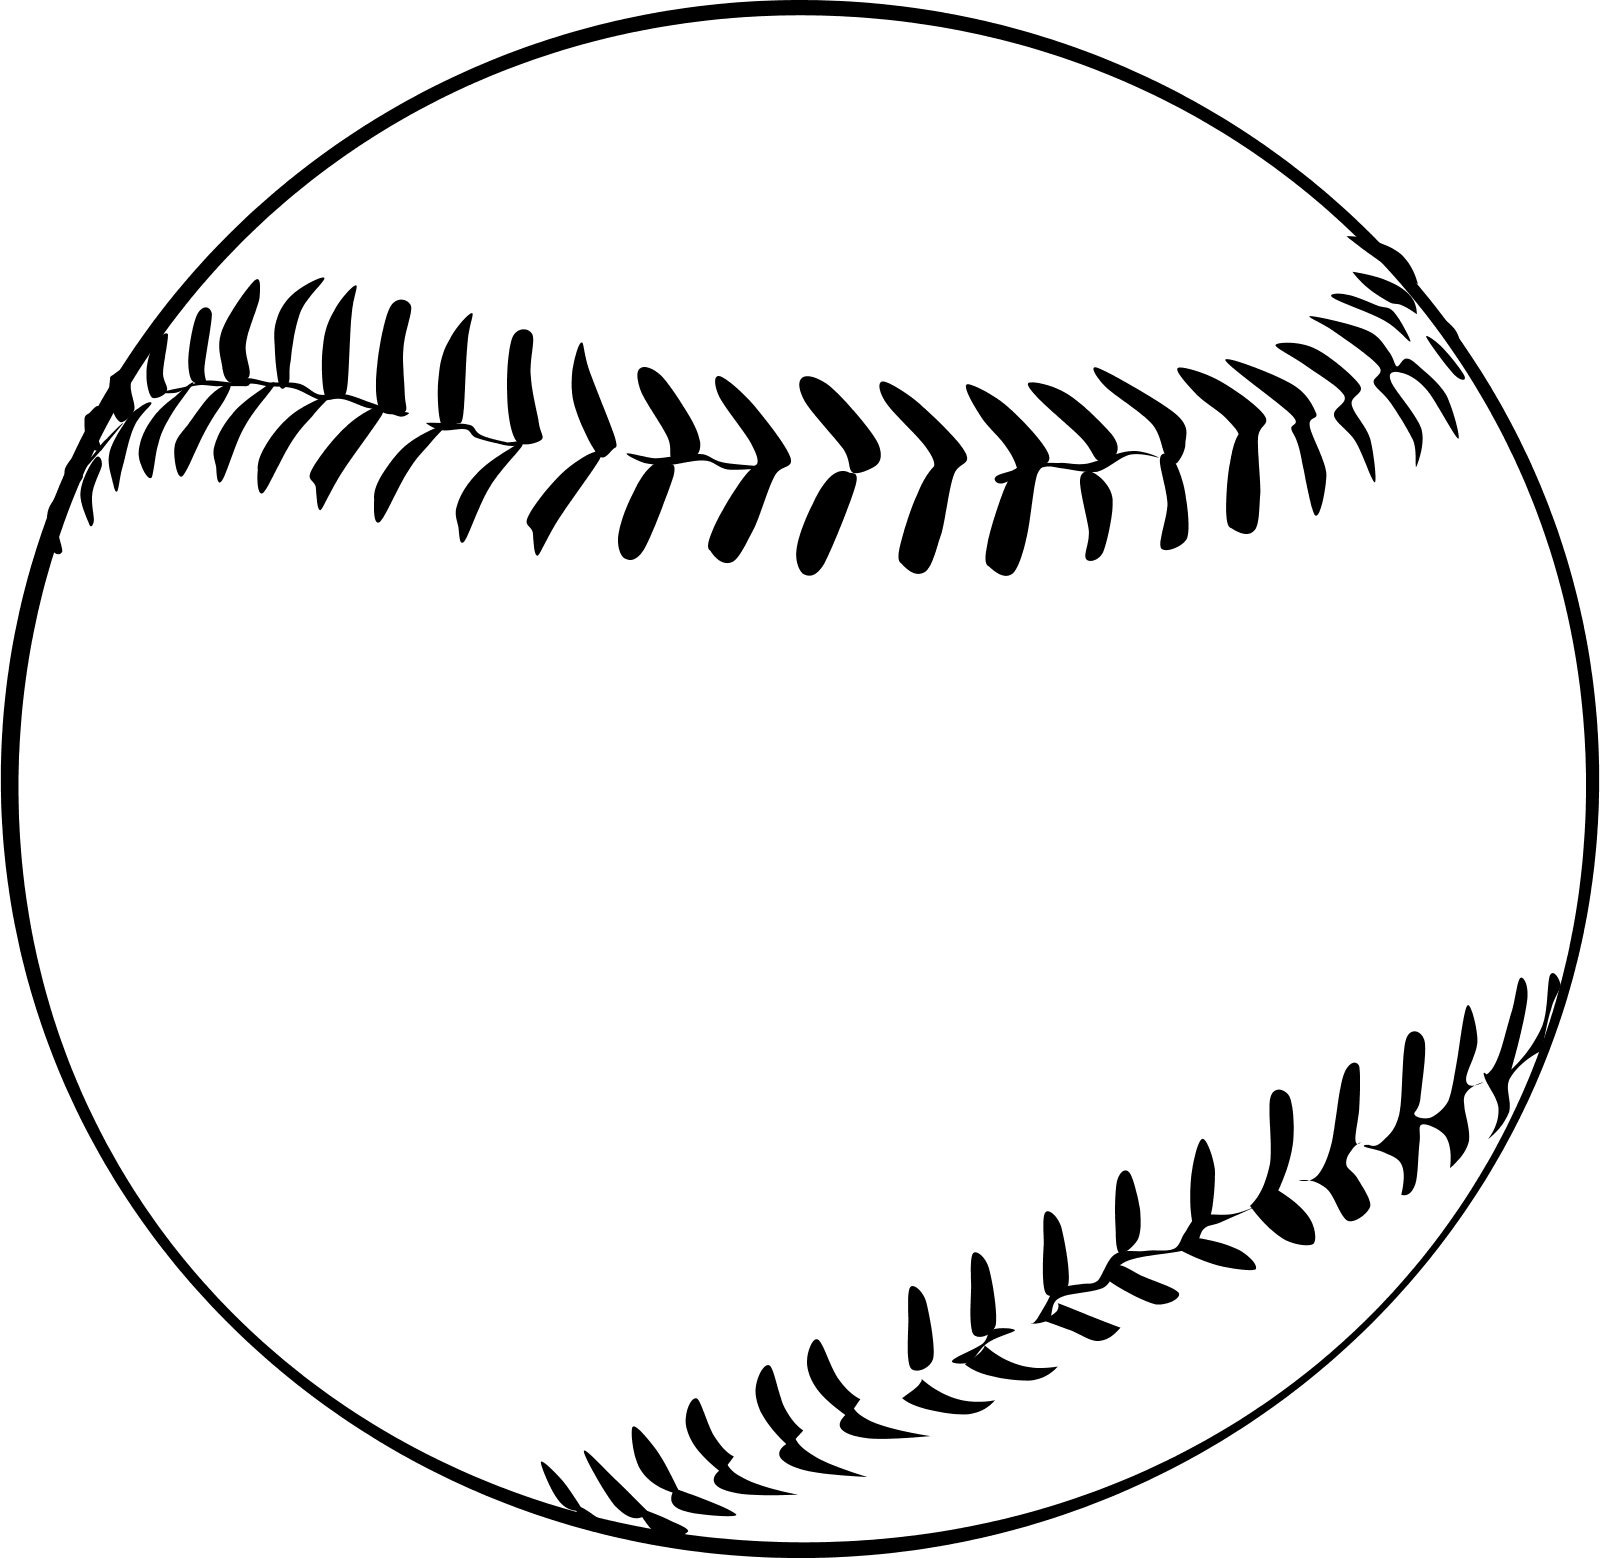 sports balls wallpaper